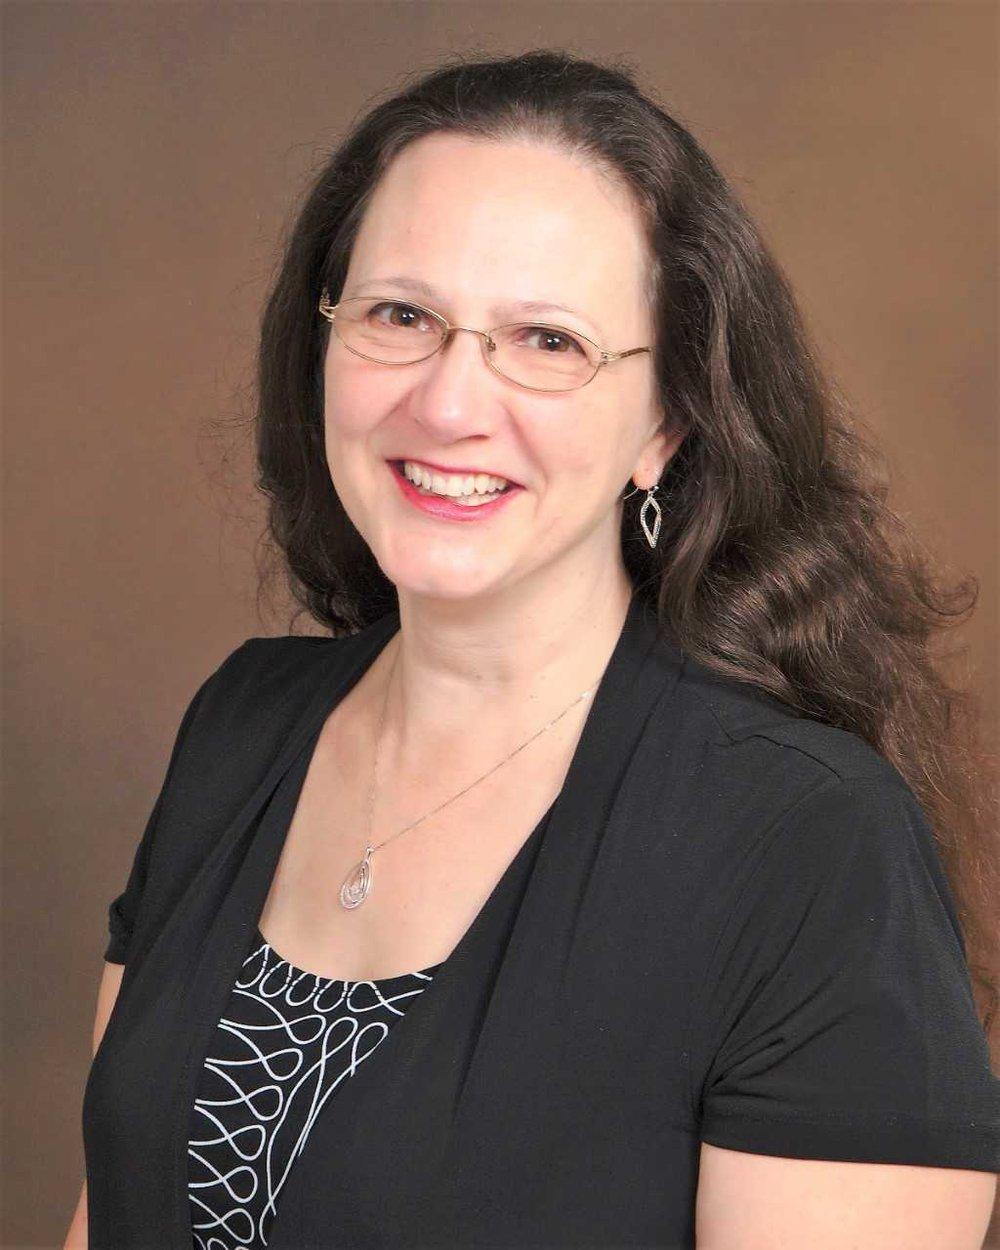 Caroline Hofmann | MS, LMHC, CAP, NBCCH, ICRC-ADC